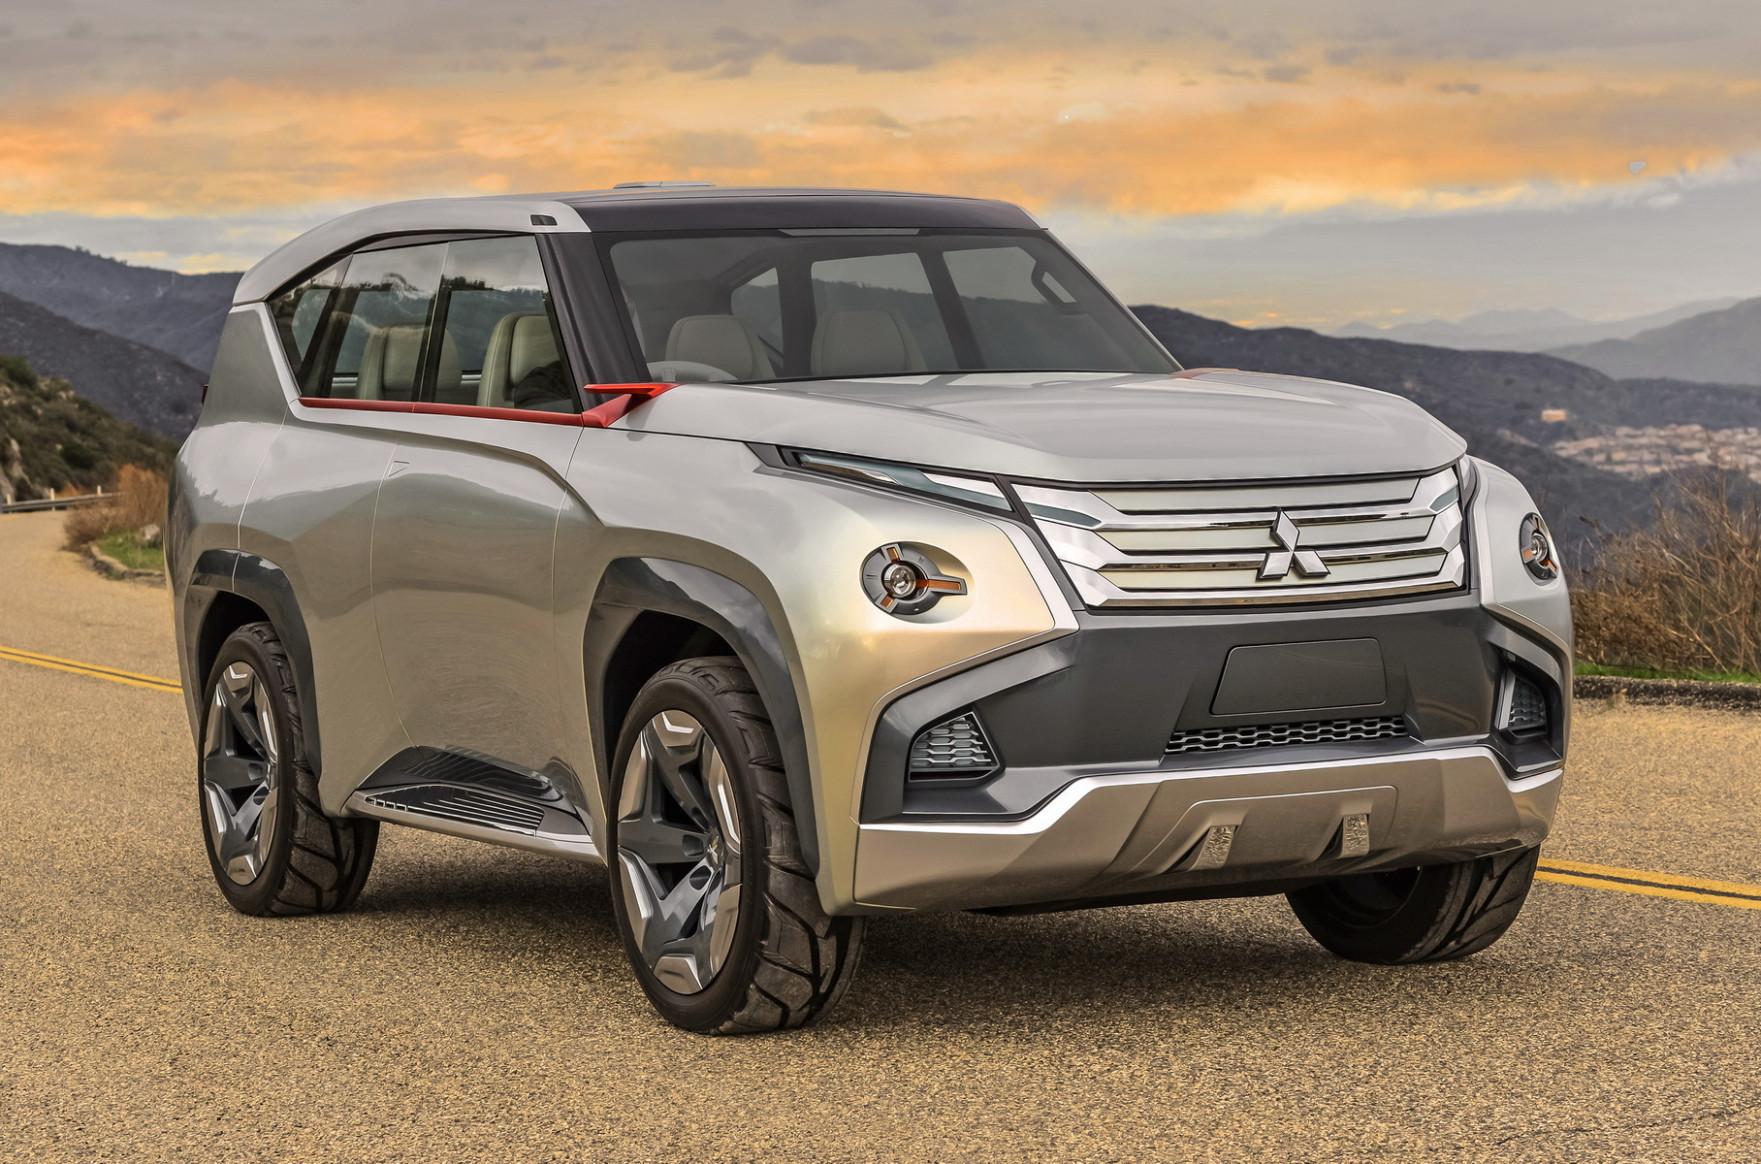 Redesign and Review Mitsubishi Nativa 2022